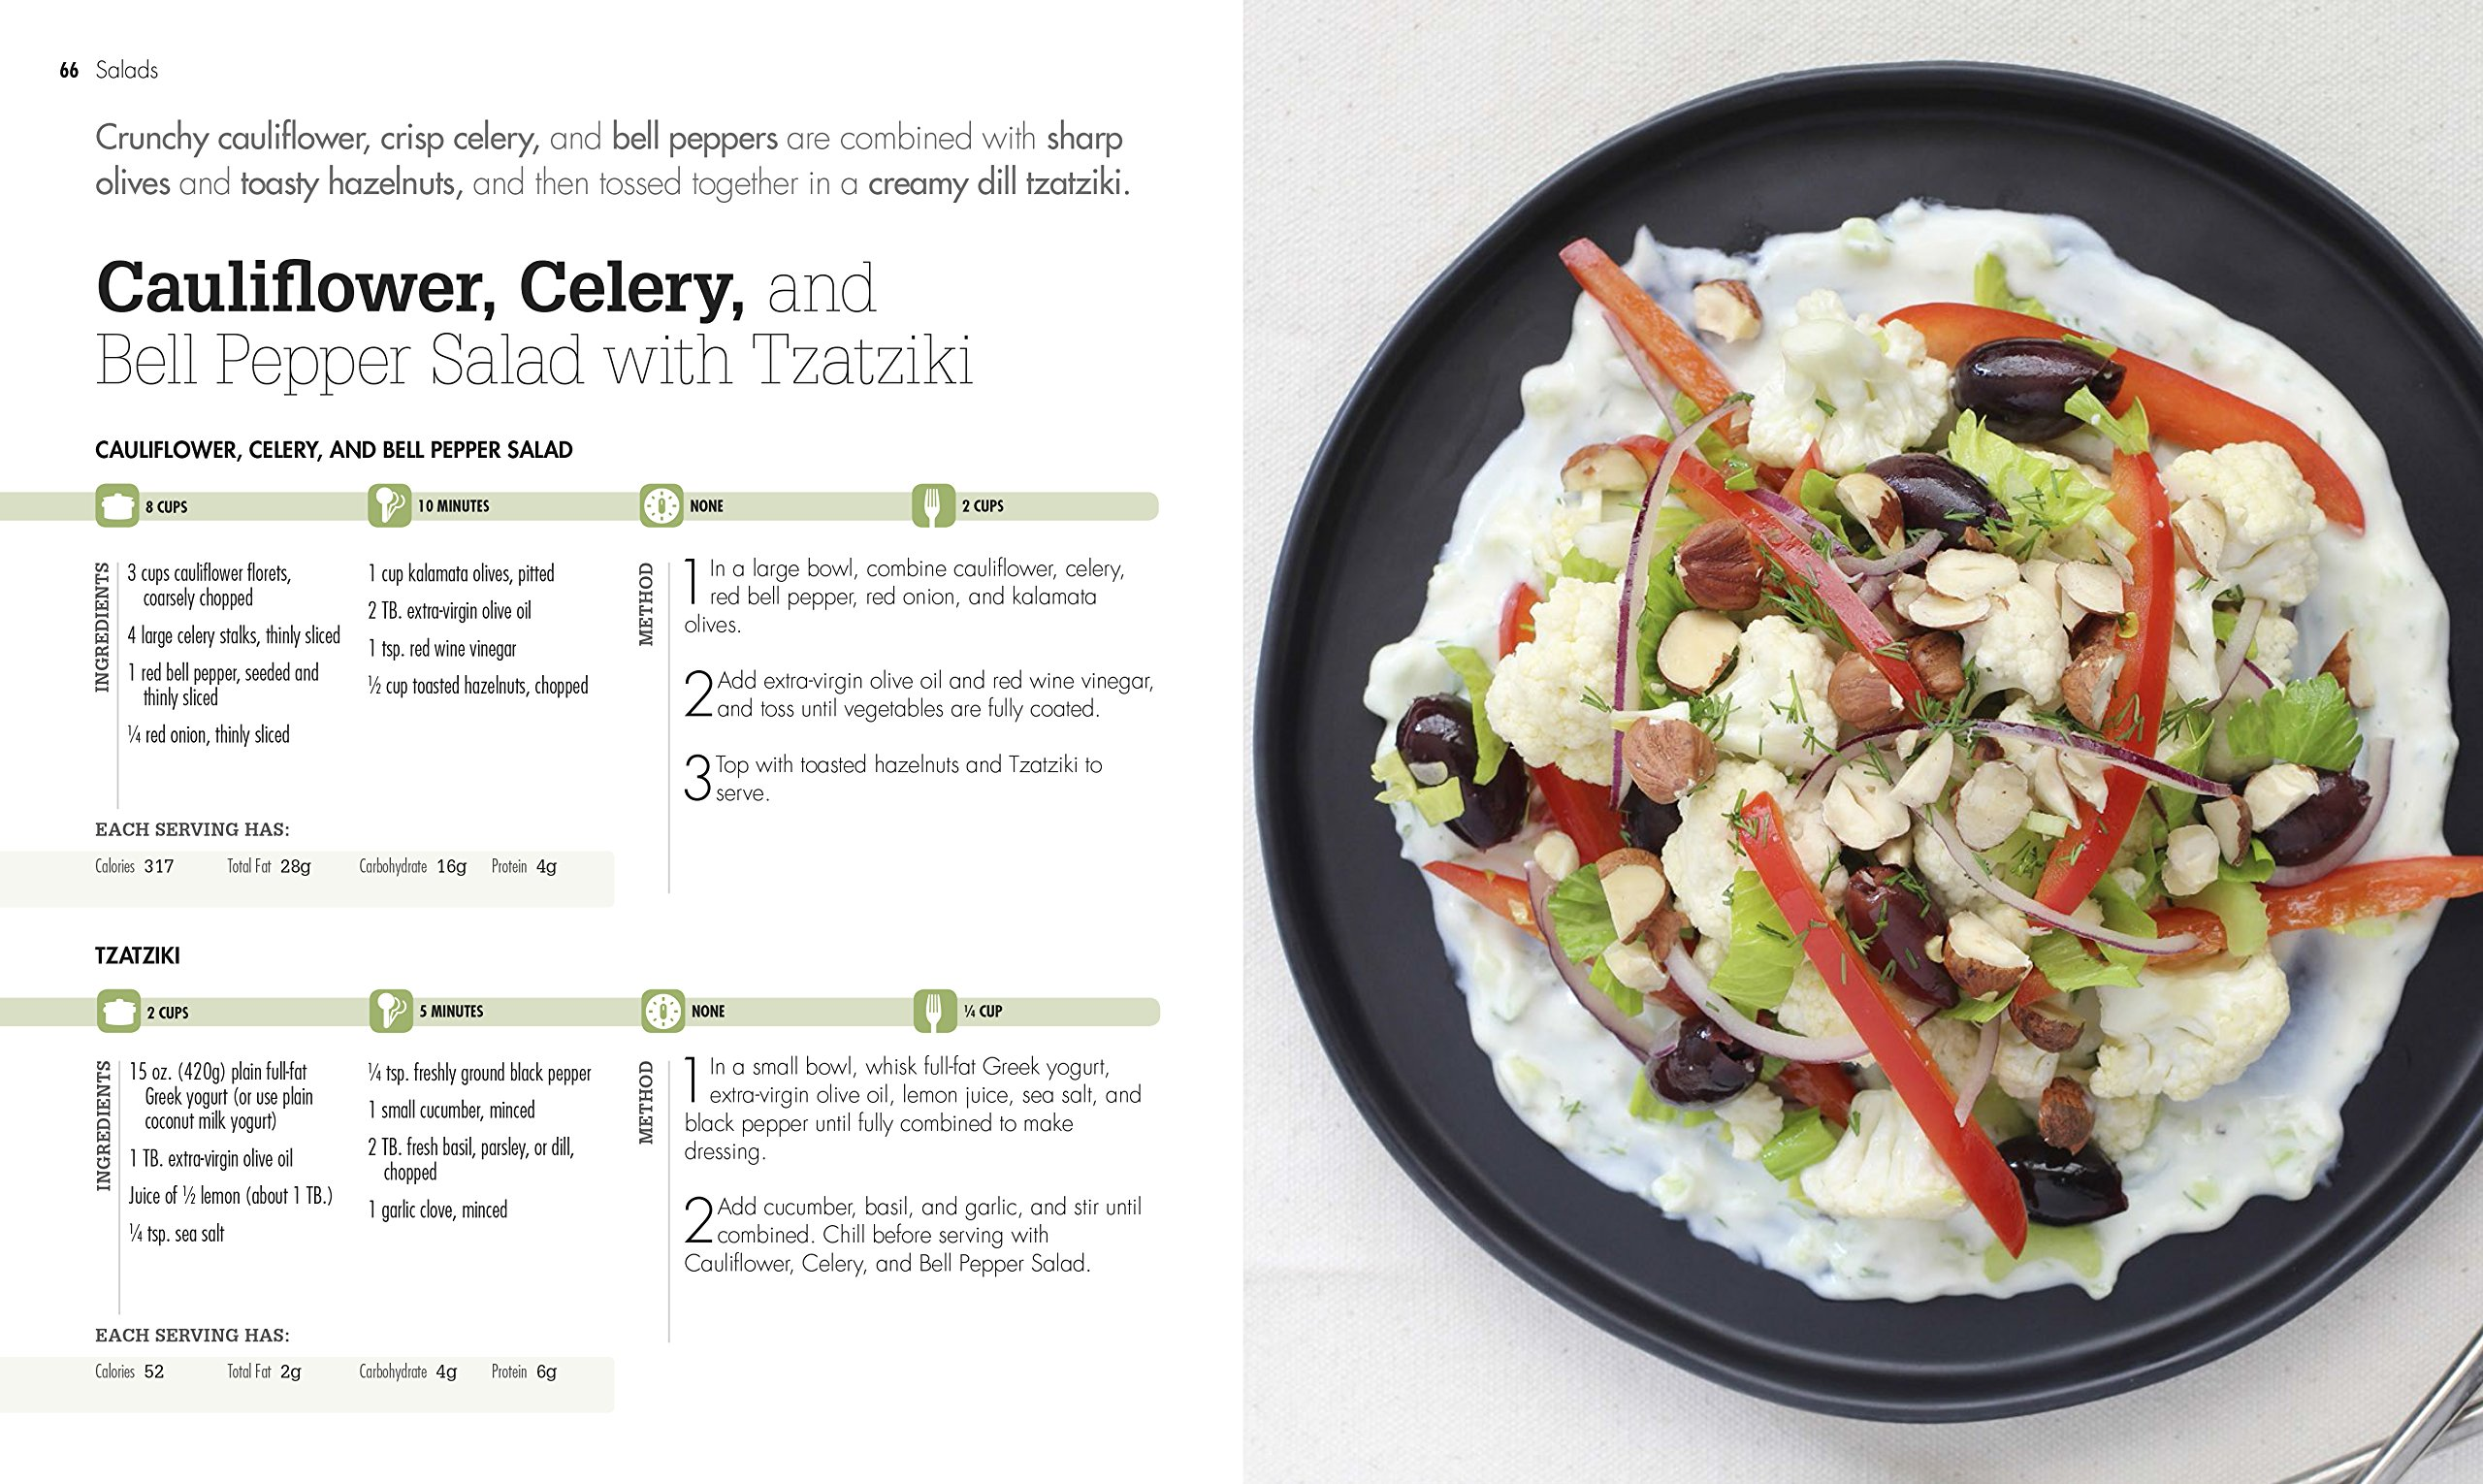 Mediterranean Paleo Cookbook (Idiot\'s Guides): Molly Pearl ...